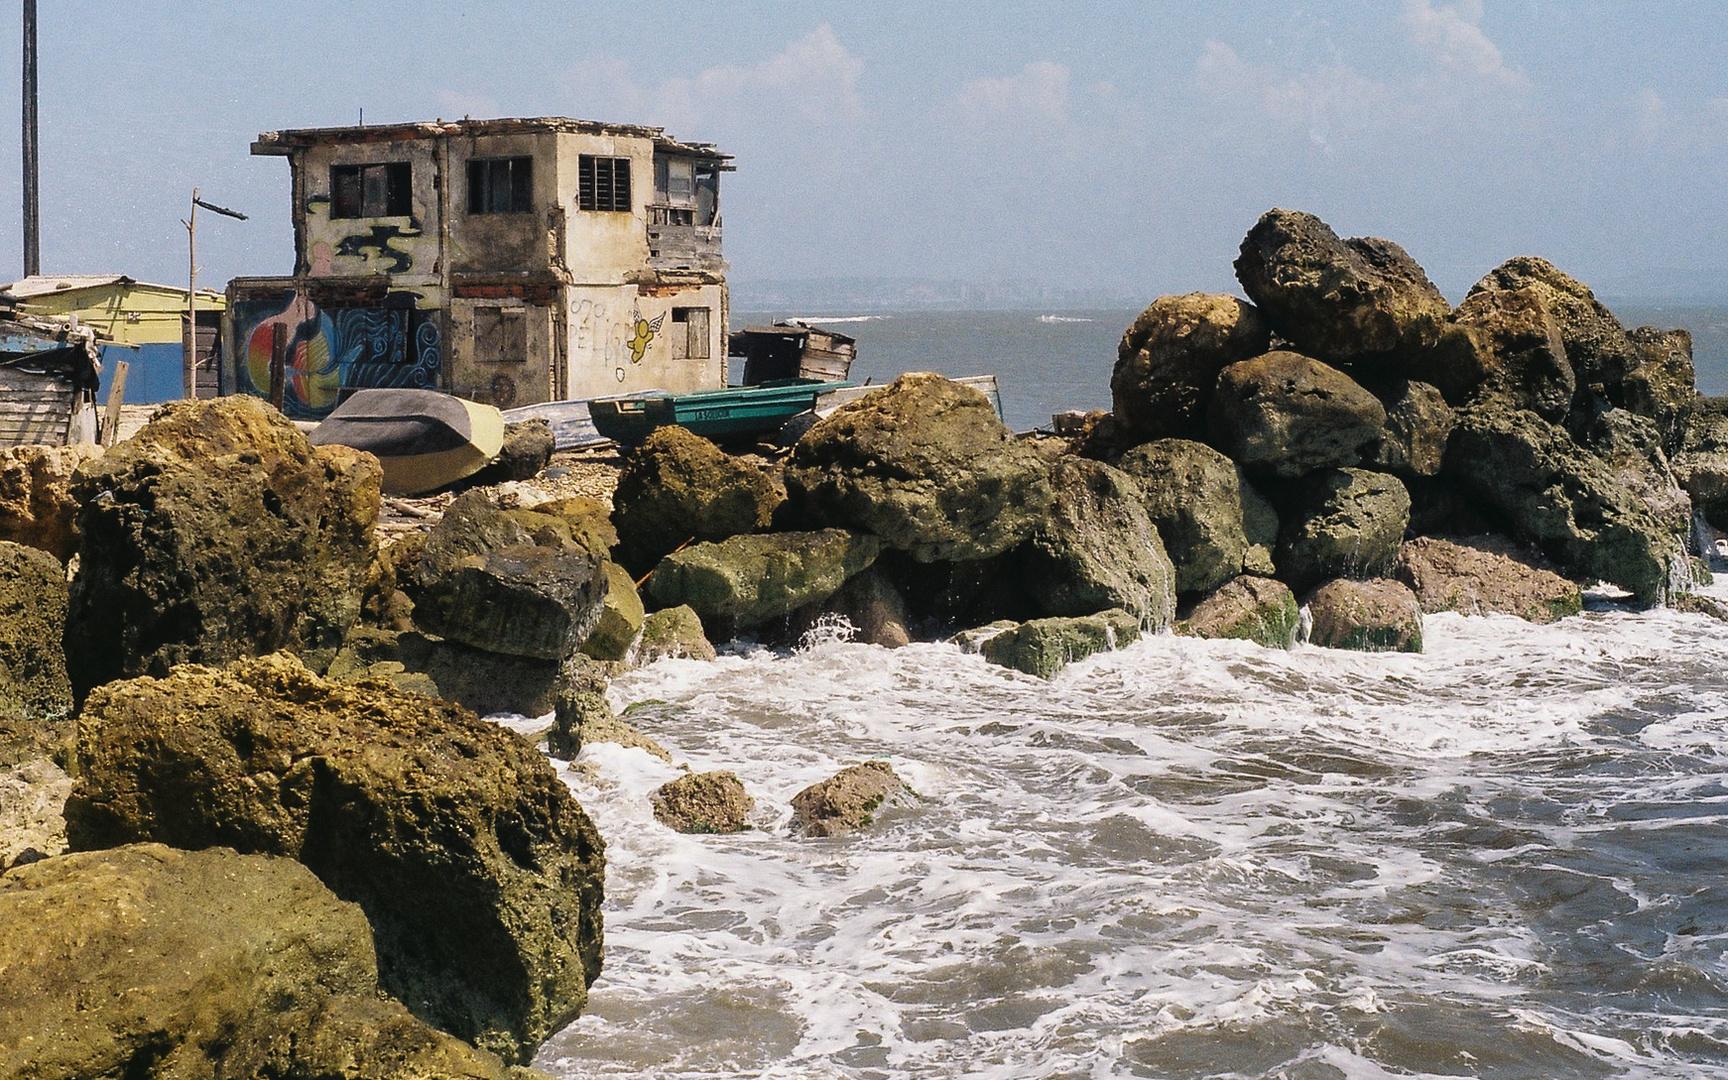 Barranquilla - Boca de Cenizas